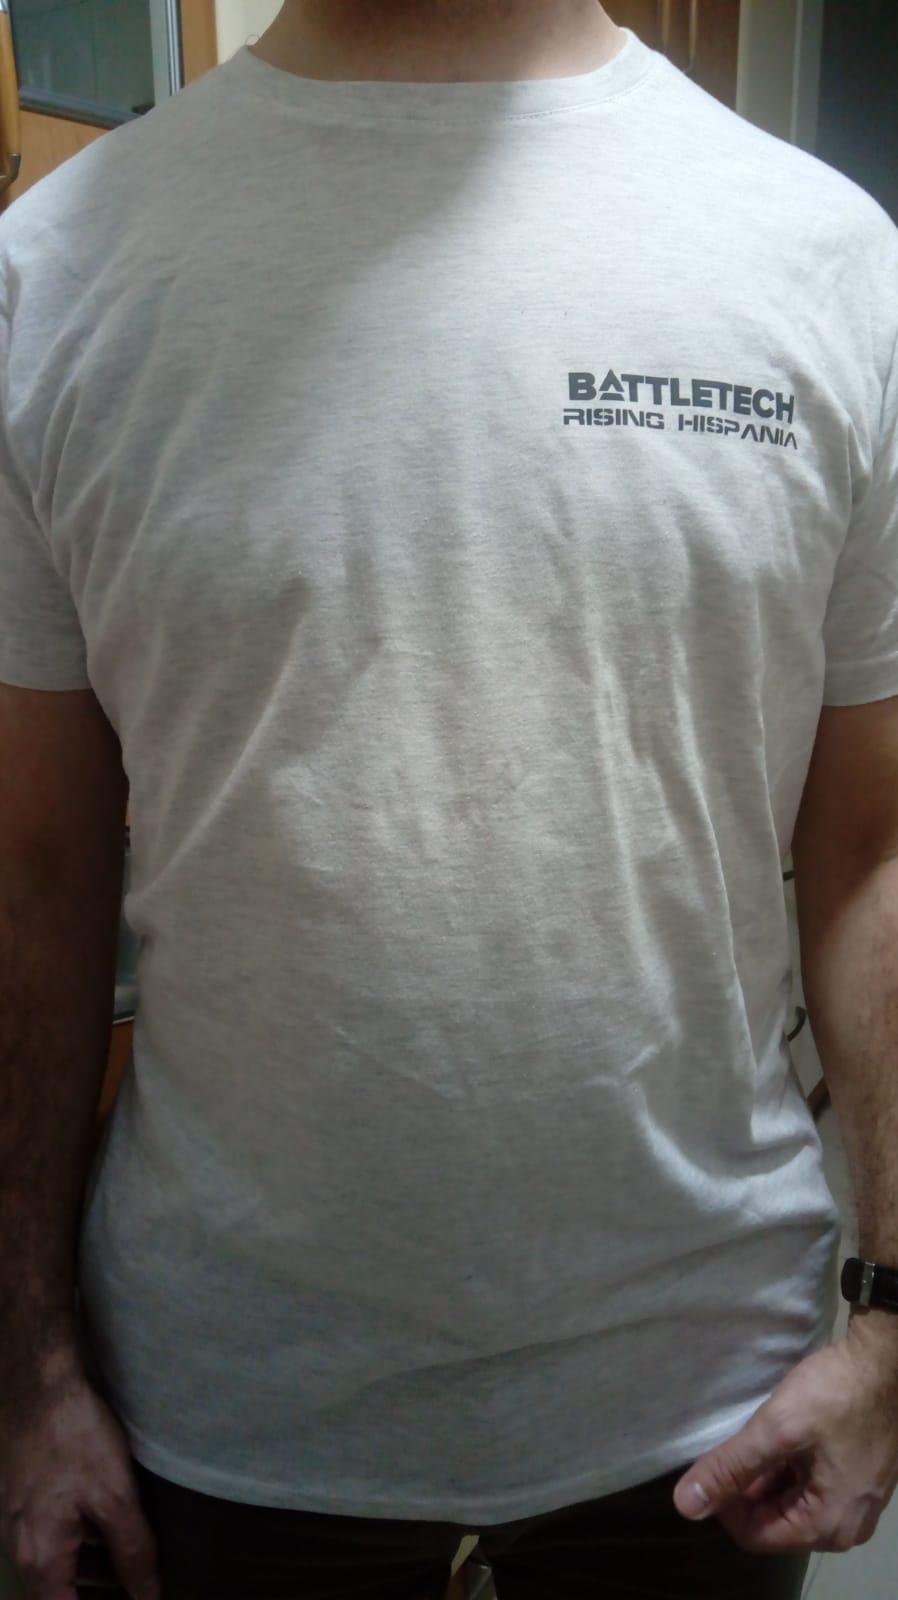 Jornadas Battletech Rising Hispania (22-23-24 febrero 2019) Frente10